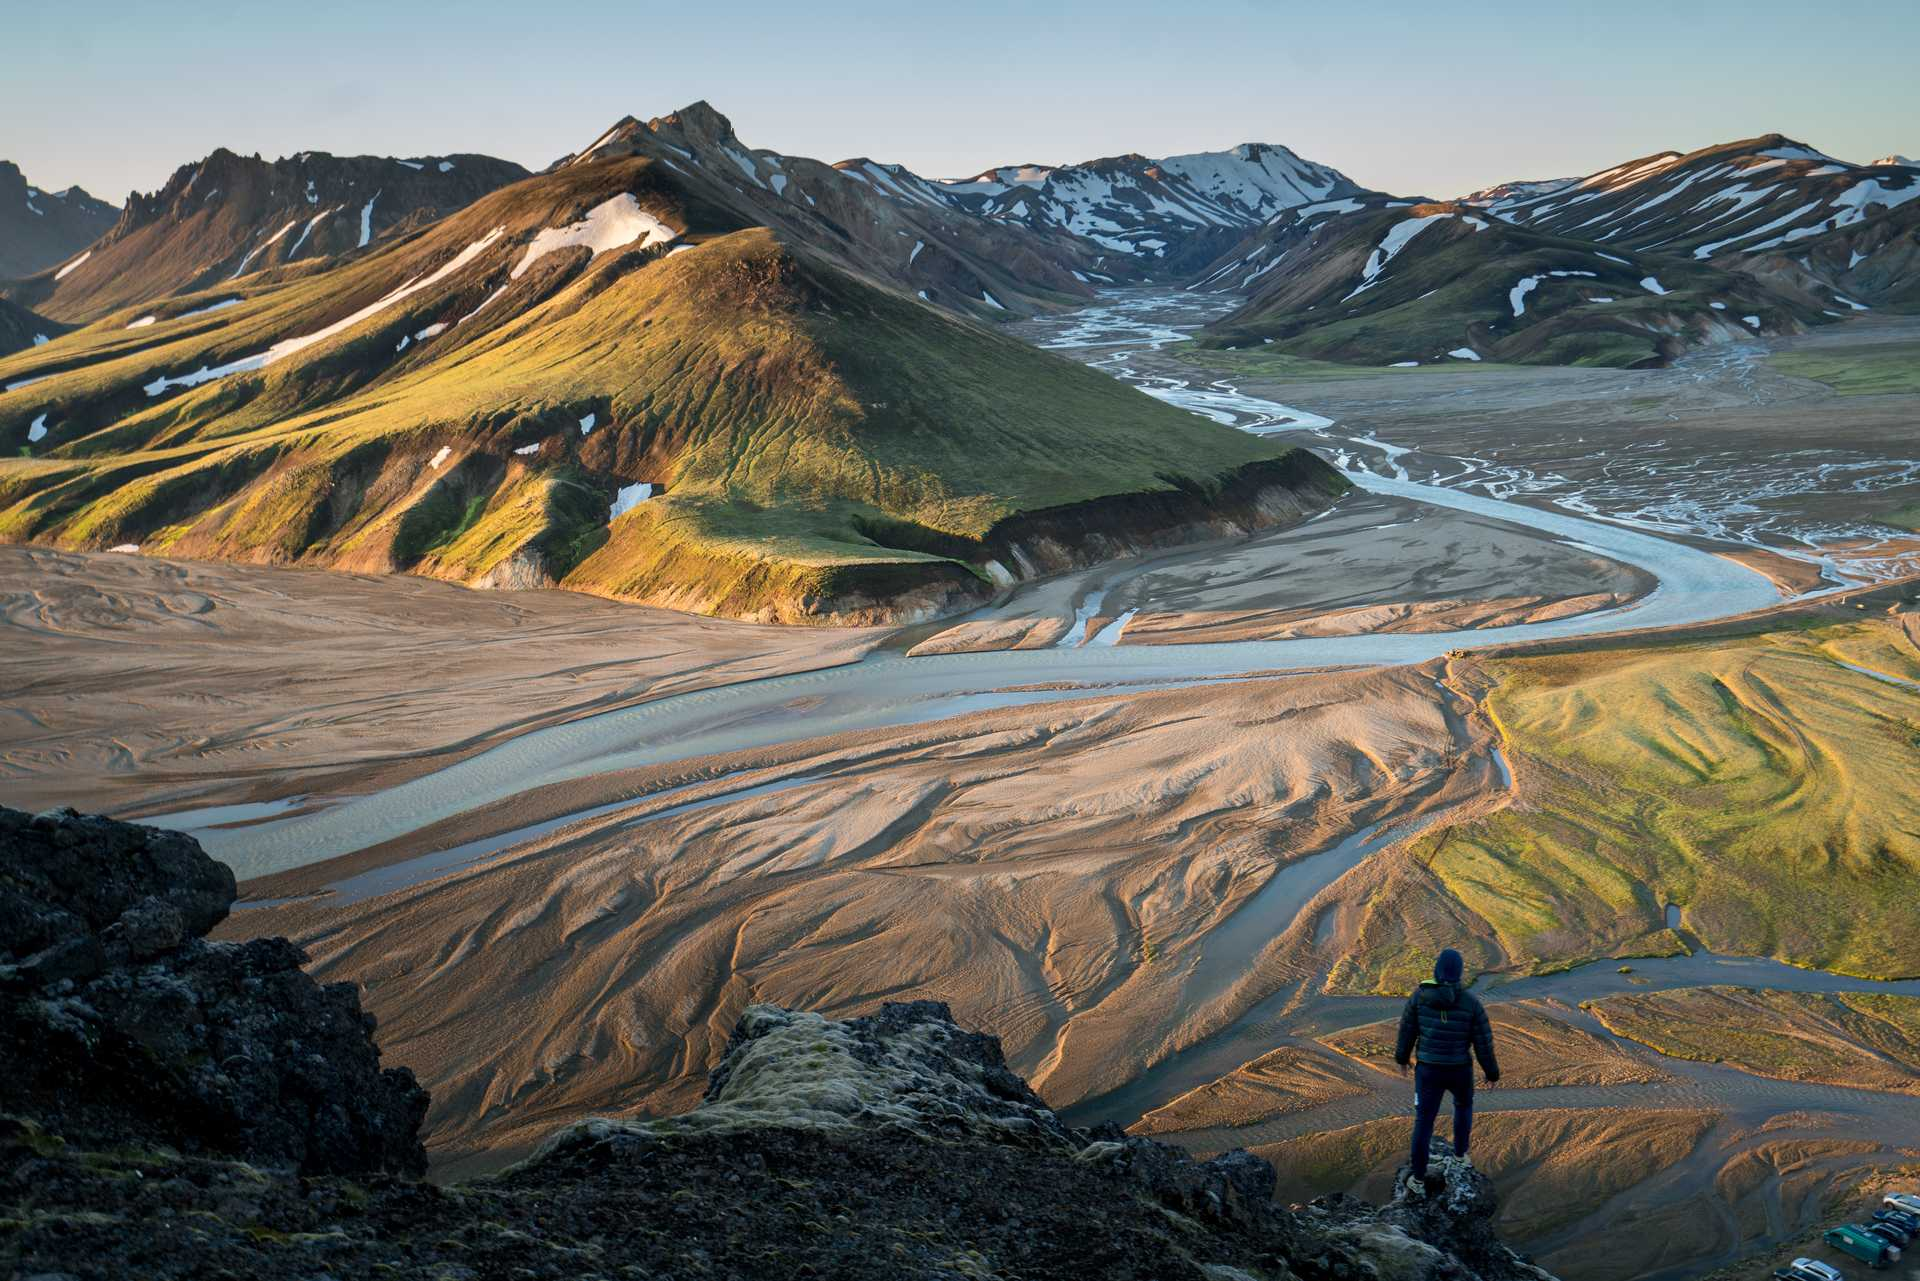 Hikers in Landmannalaugar, Iceland